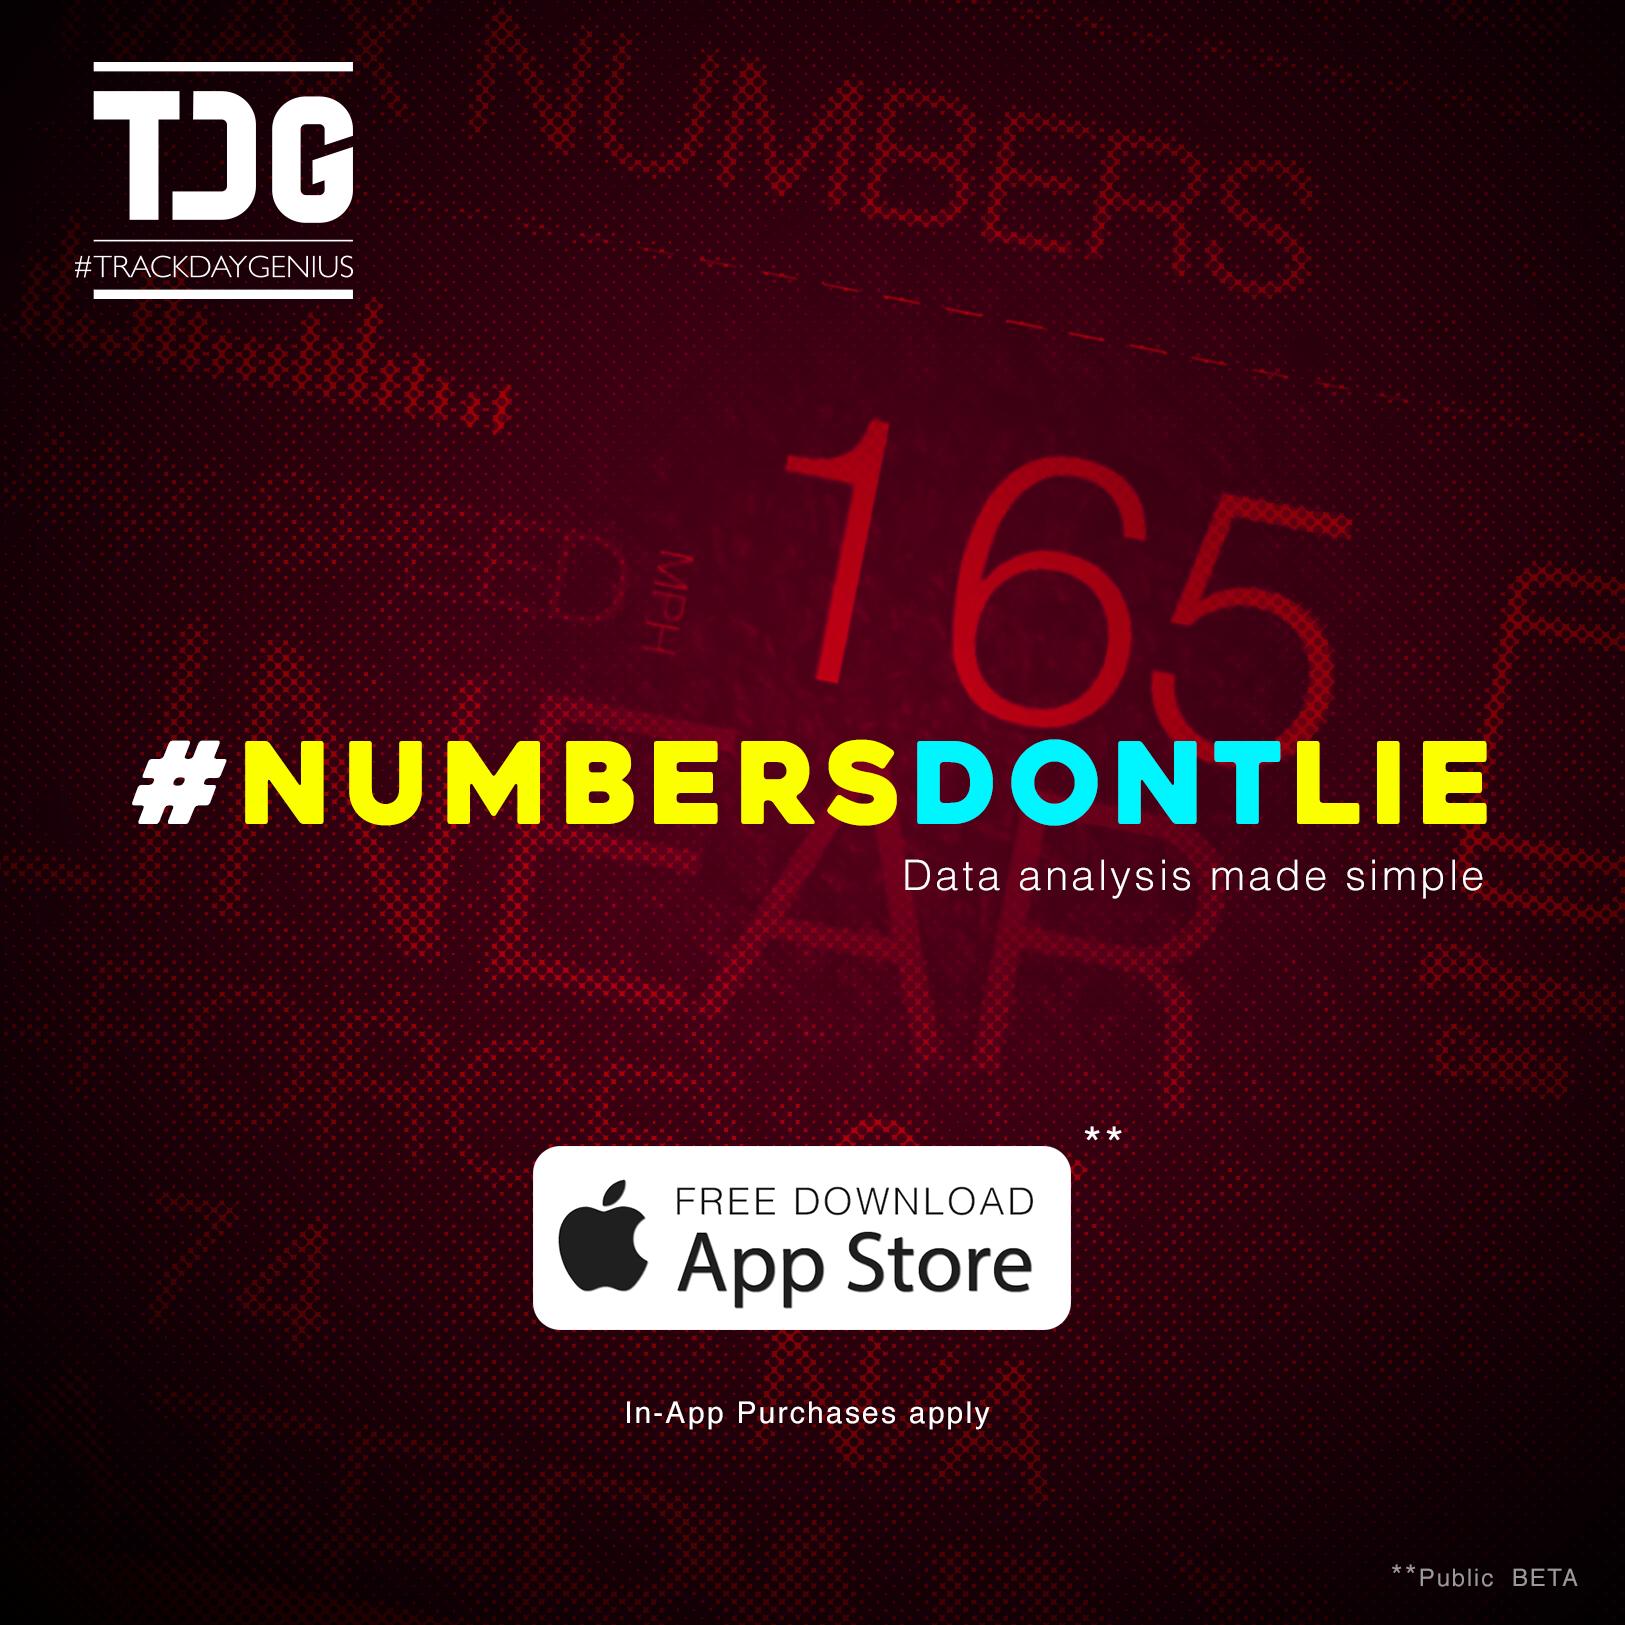 tdg-hashTag-numbersDontLie-sq